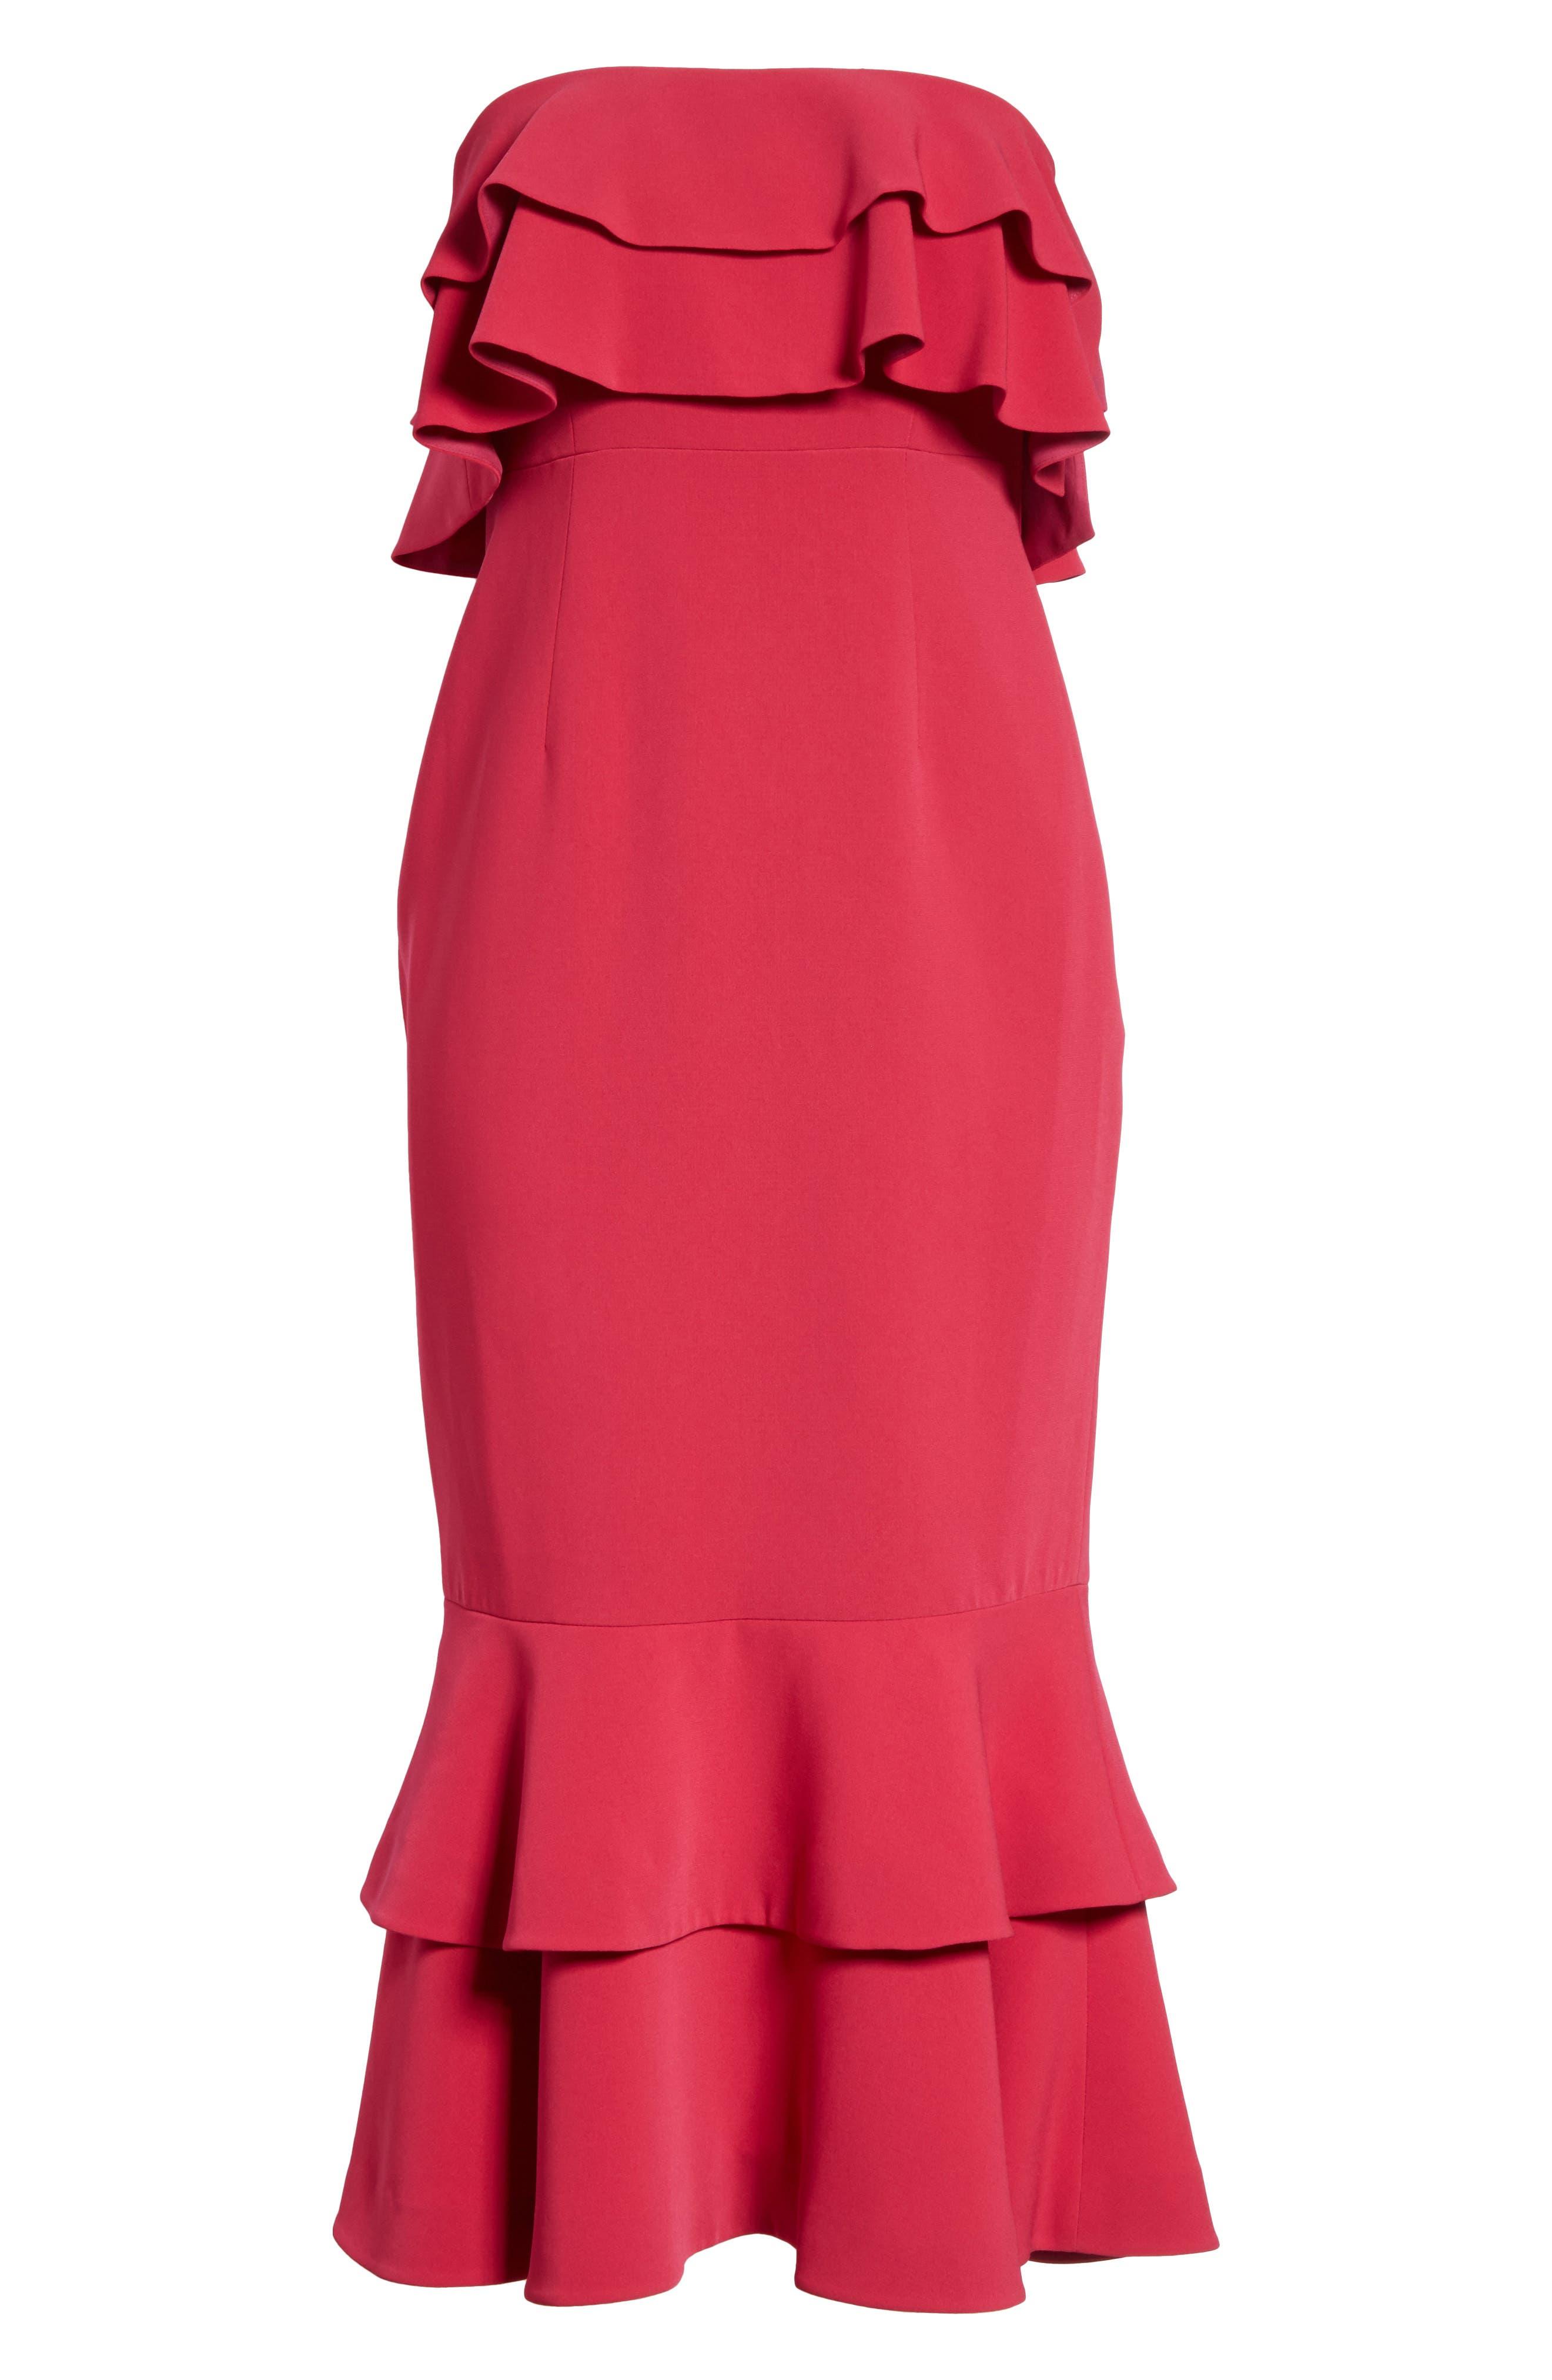 Ezana Ruffle Strapless Mermaid Dress,                             Alternate thumbnail 6, color,                             698